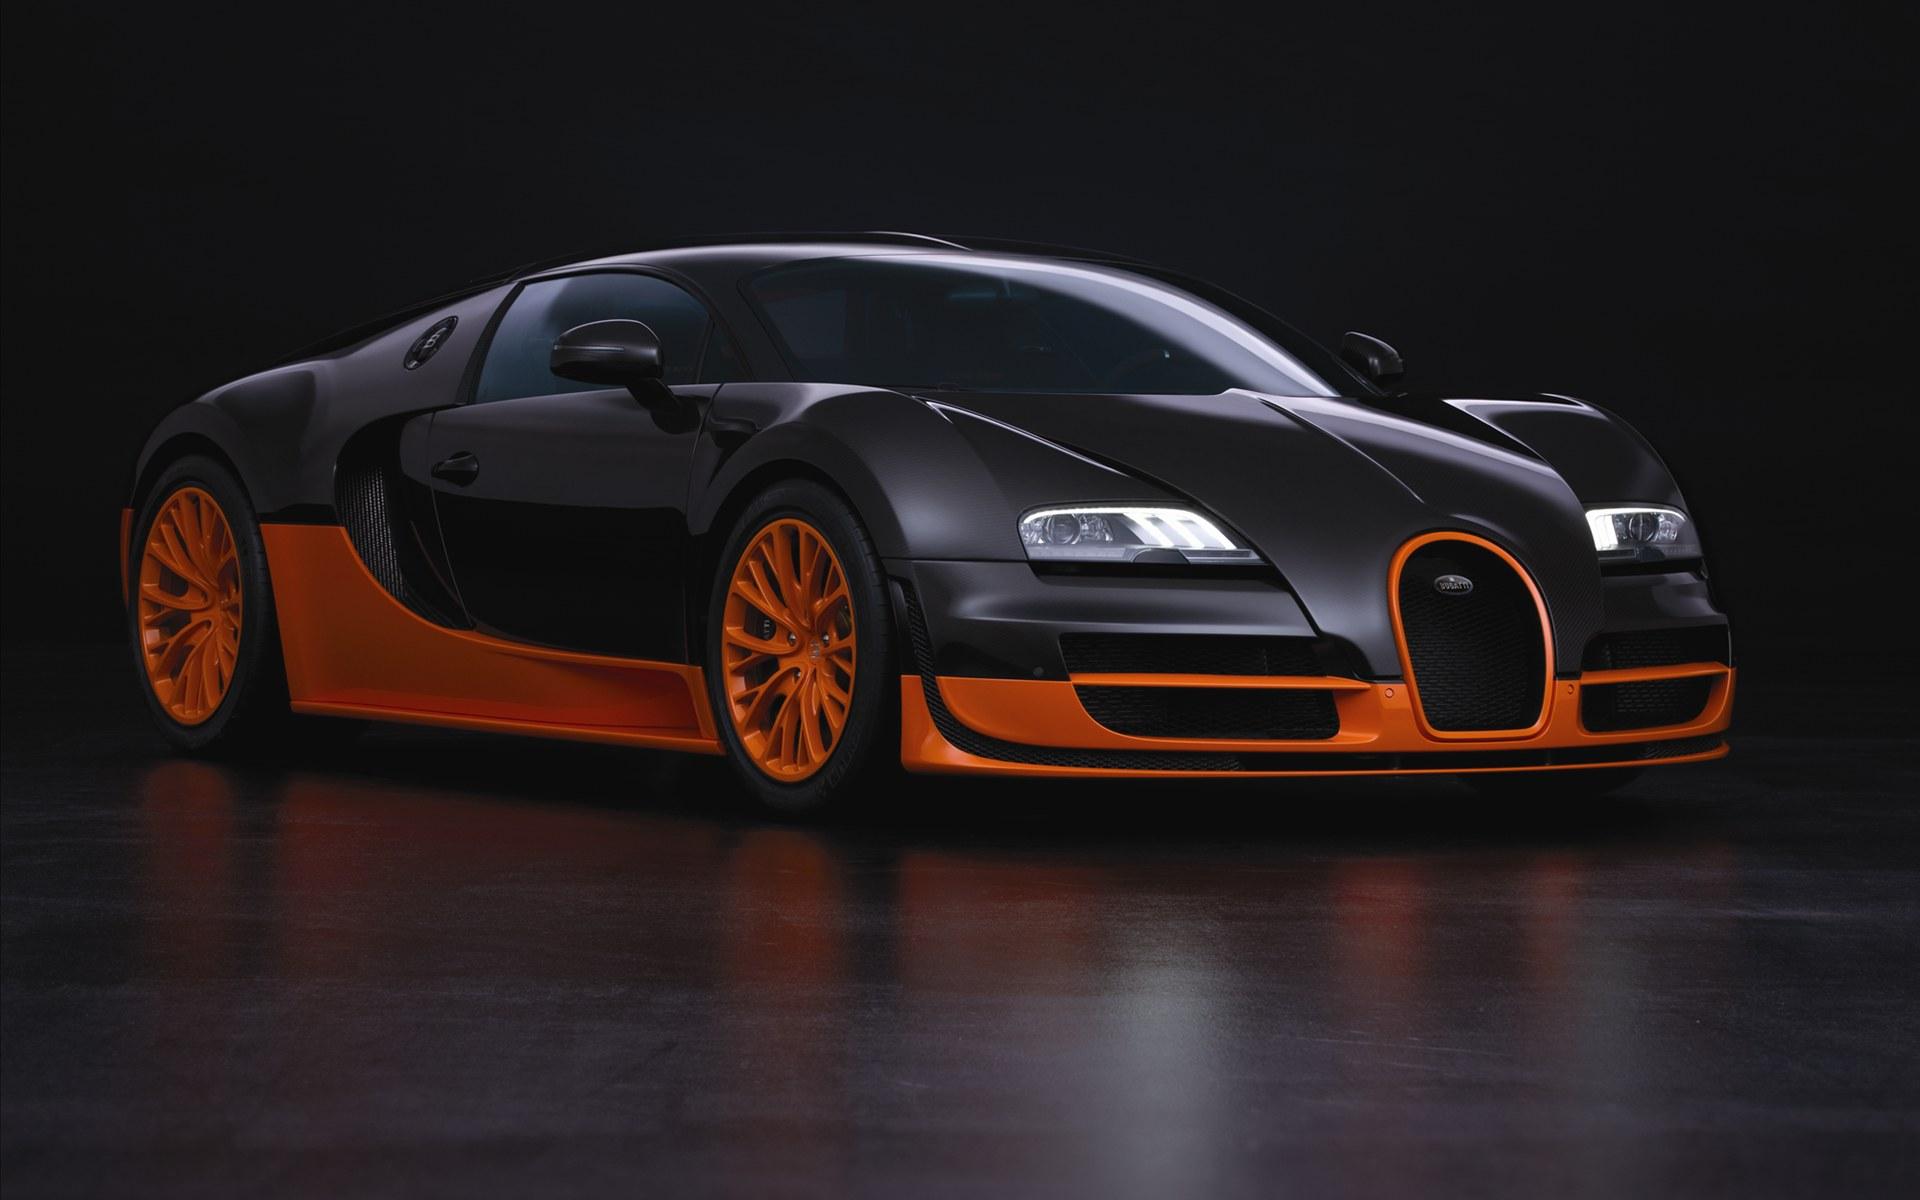 bugatti veyron wallpaper widescreen 5600 hd wallpapers in cars - Bugatti Veyron Wallpaper